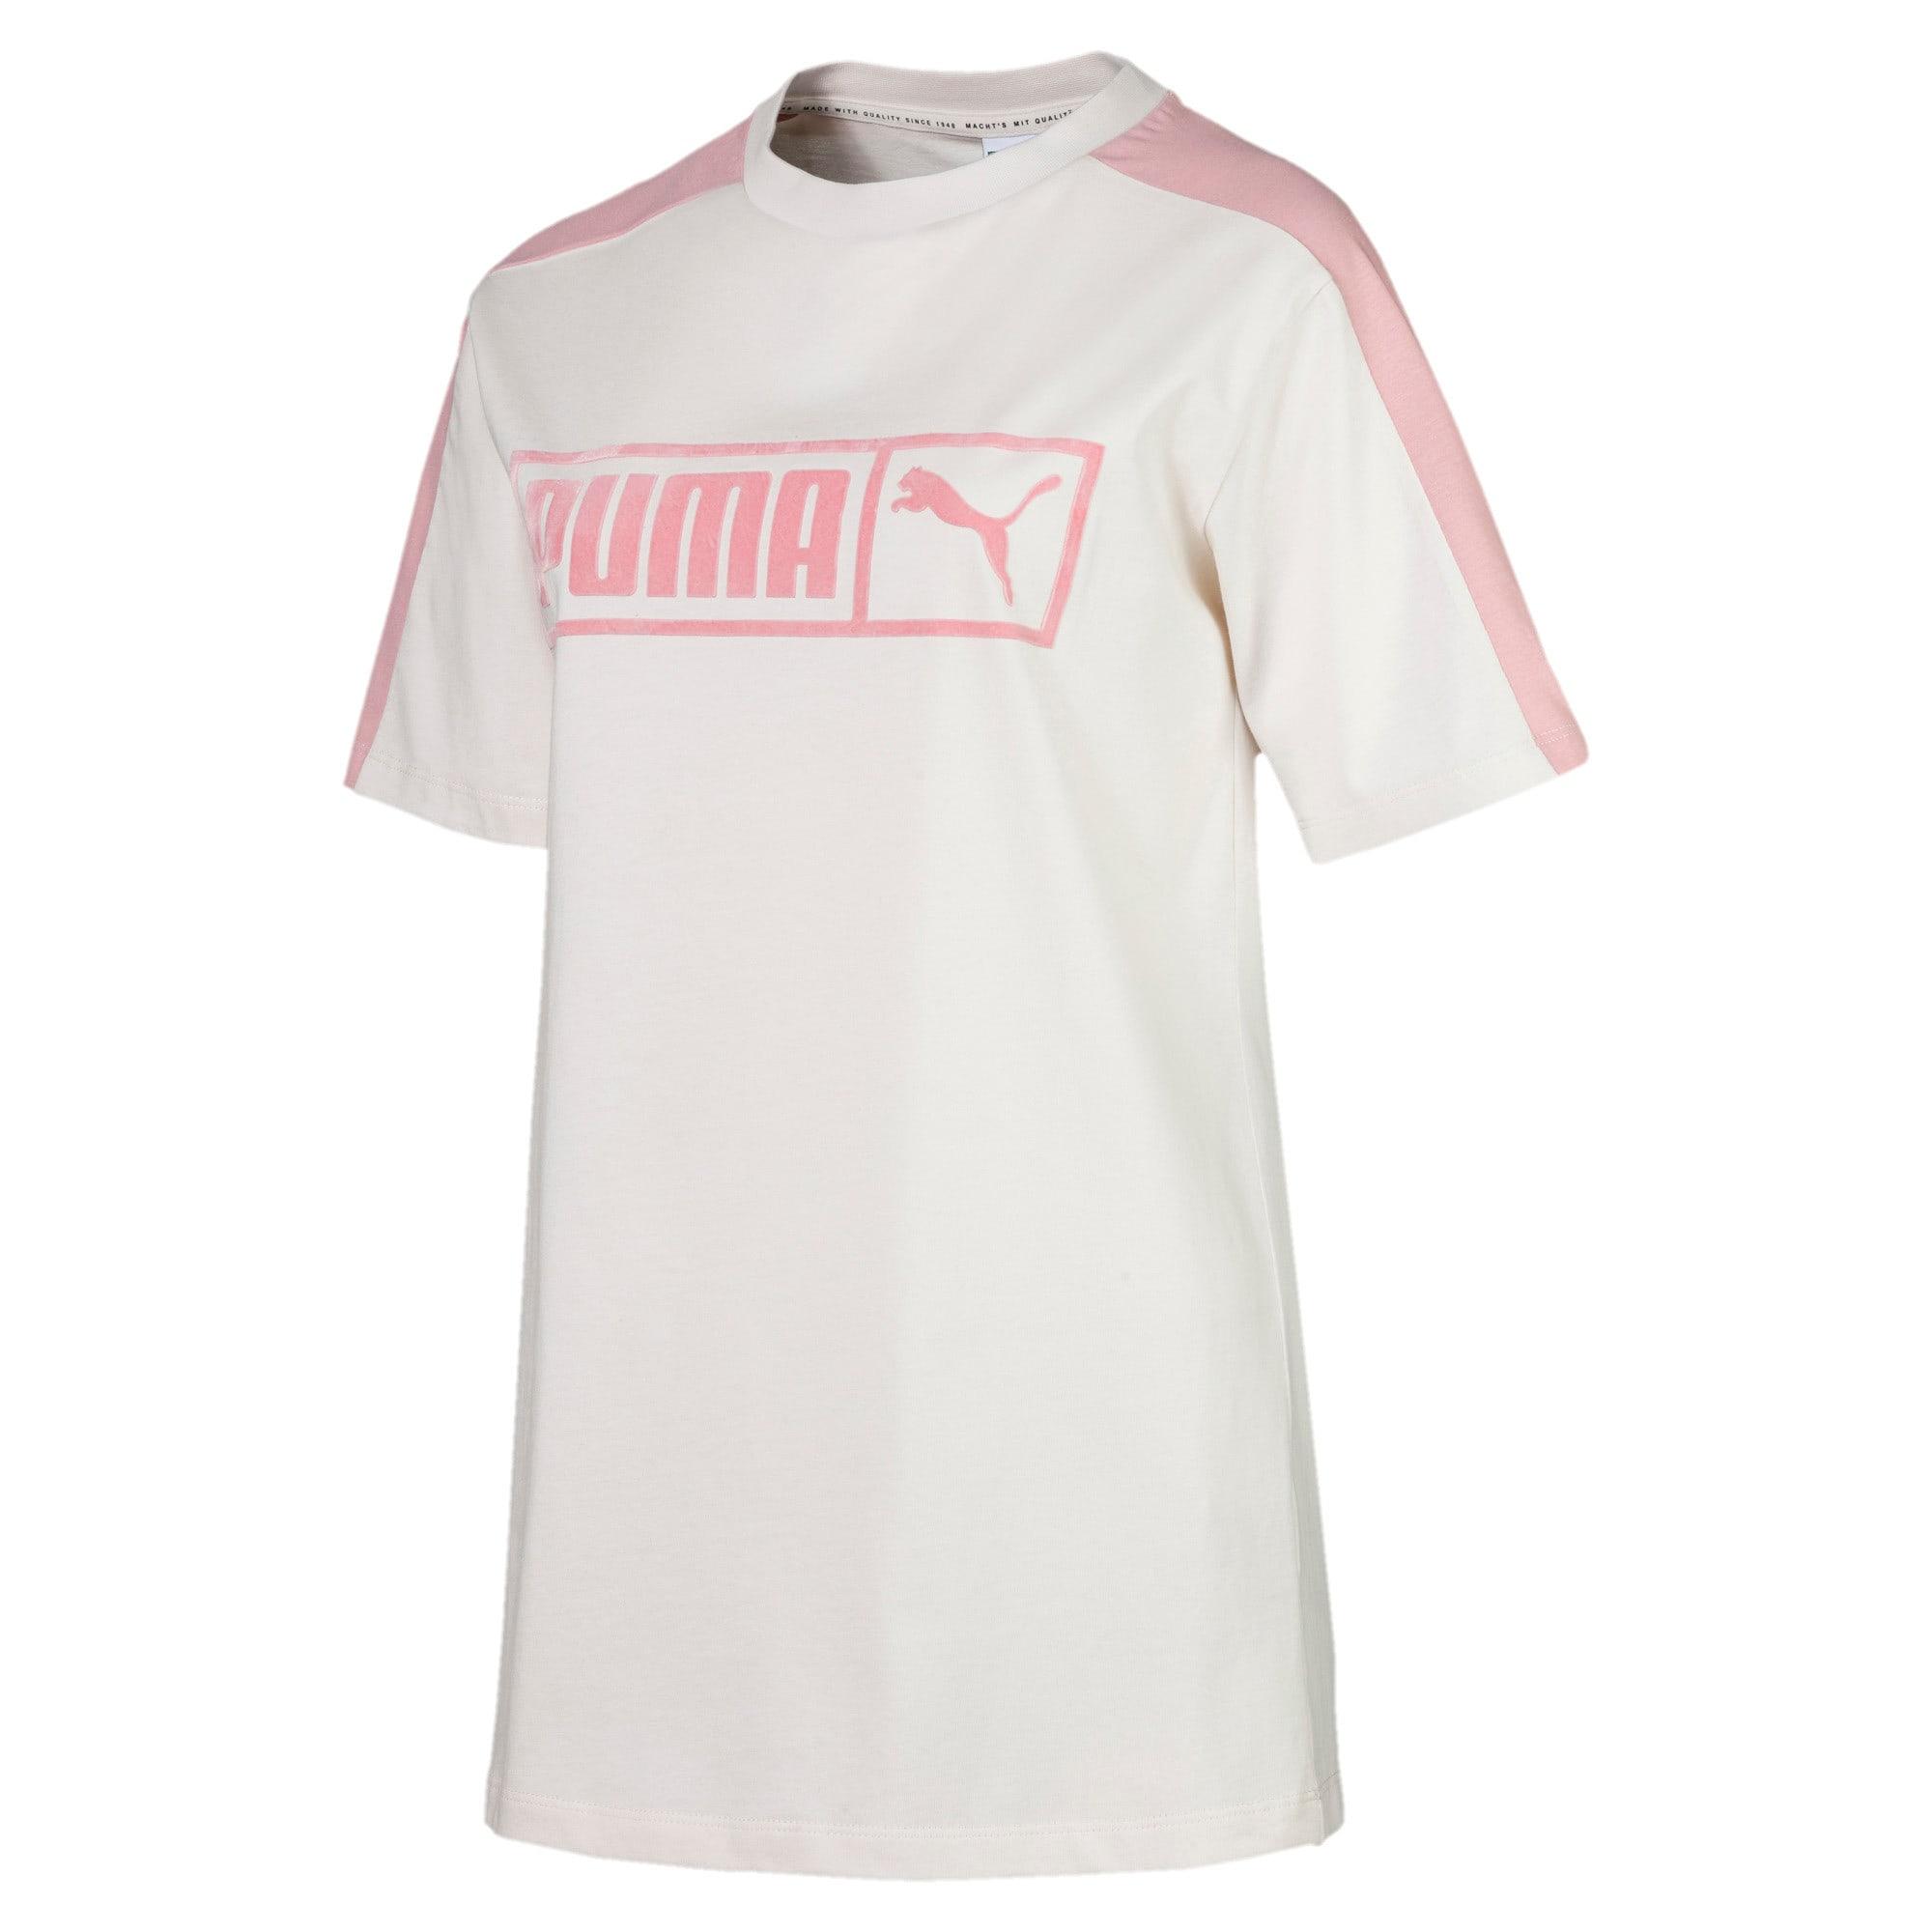 Miniatura 1 de Camiseta Classics No.2 T7 para mujer, Pastel Parchment, mediano